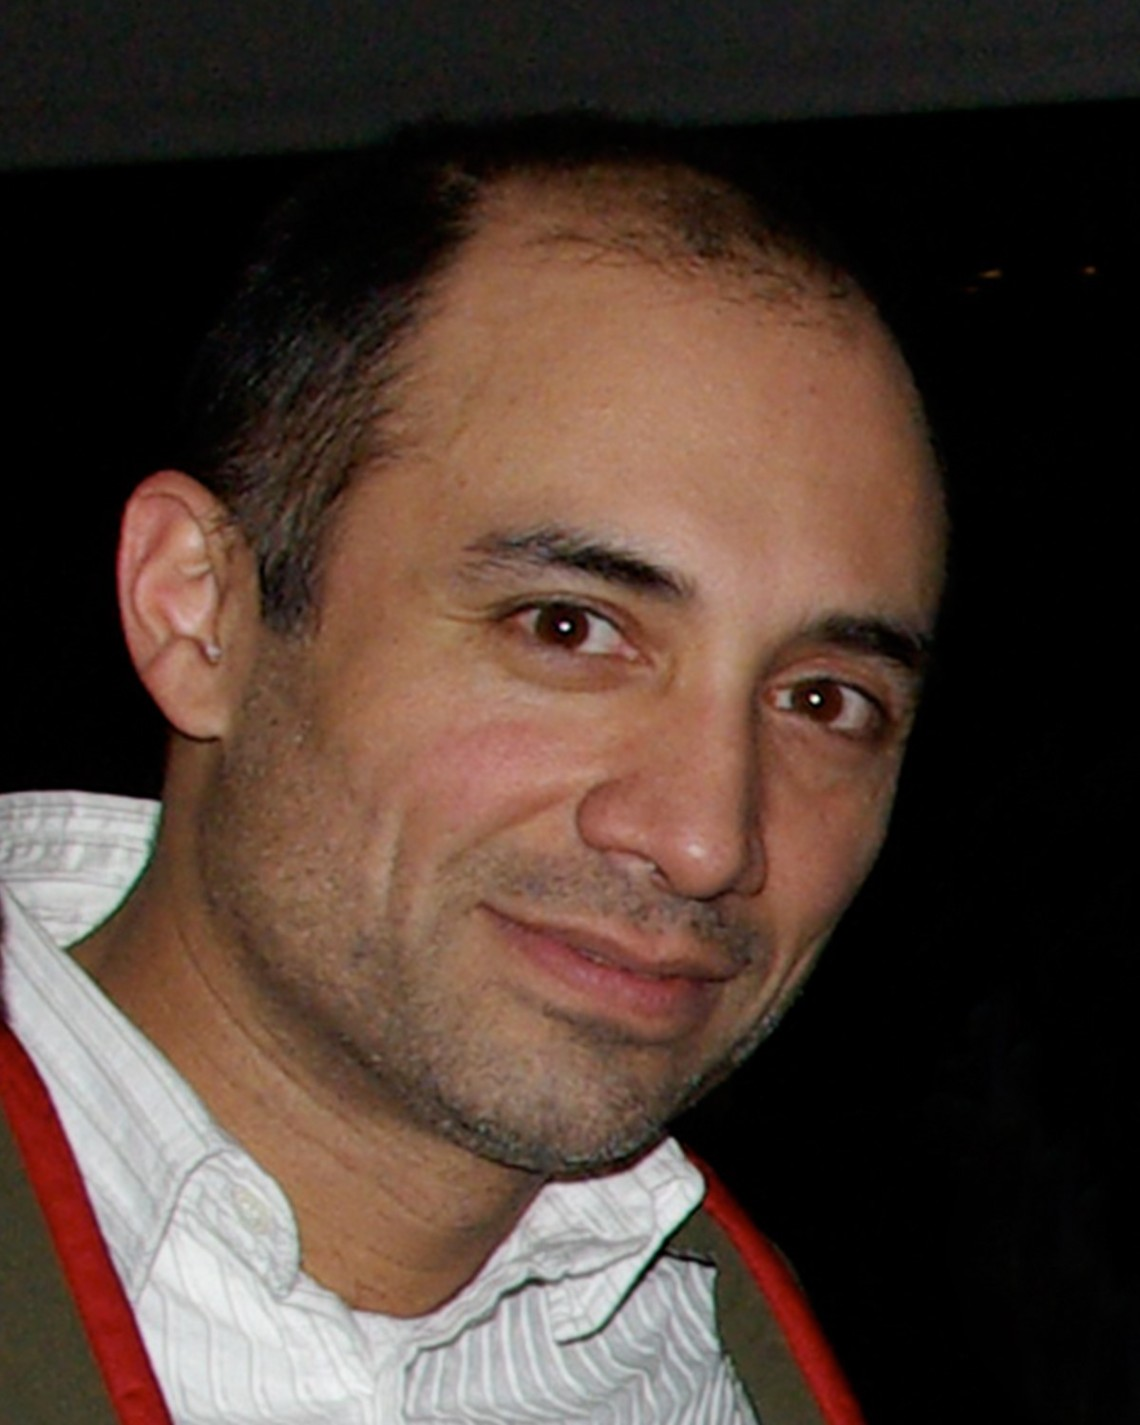 Vali Mahlouji